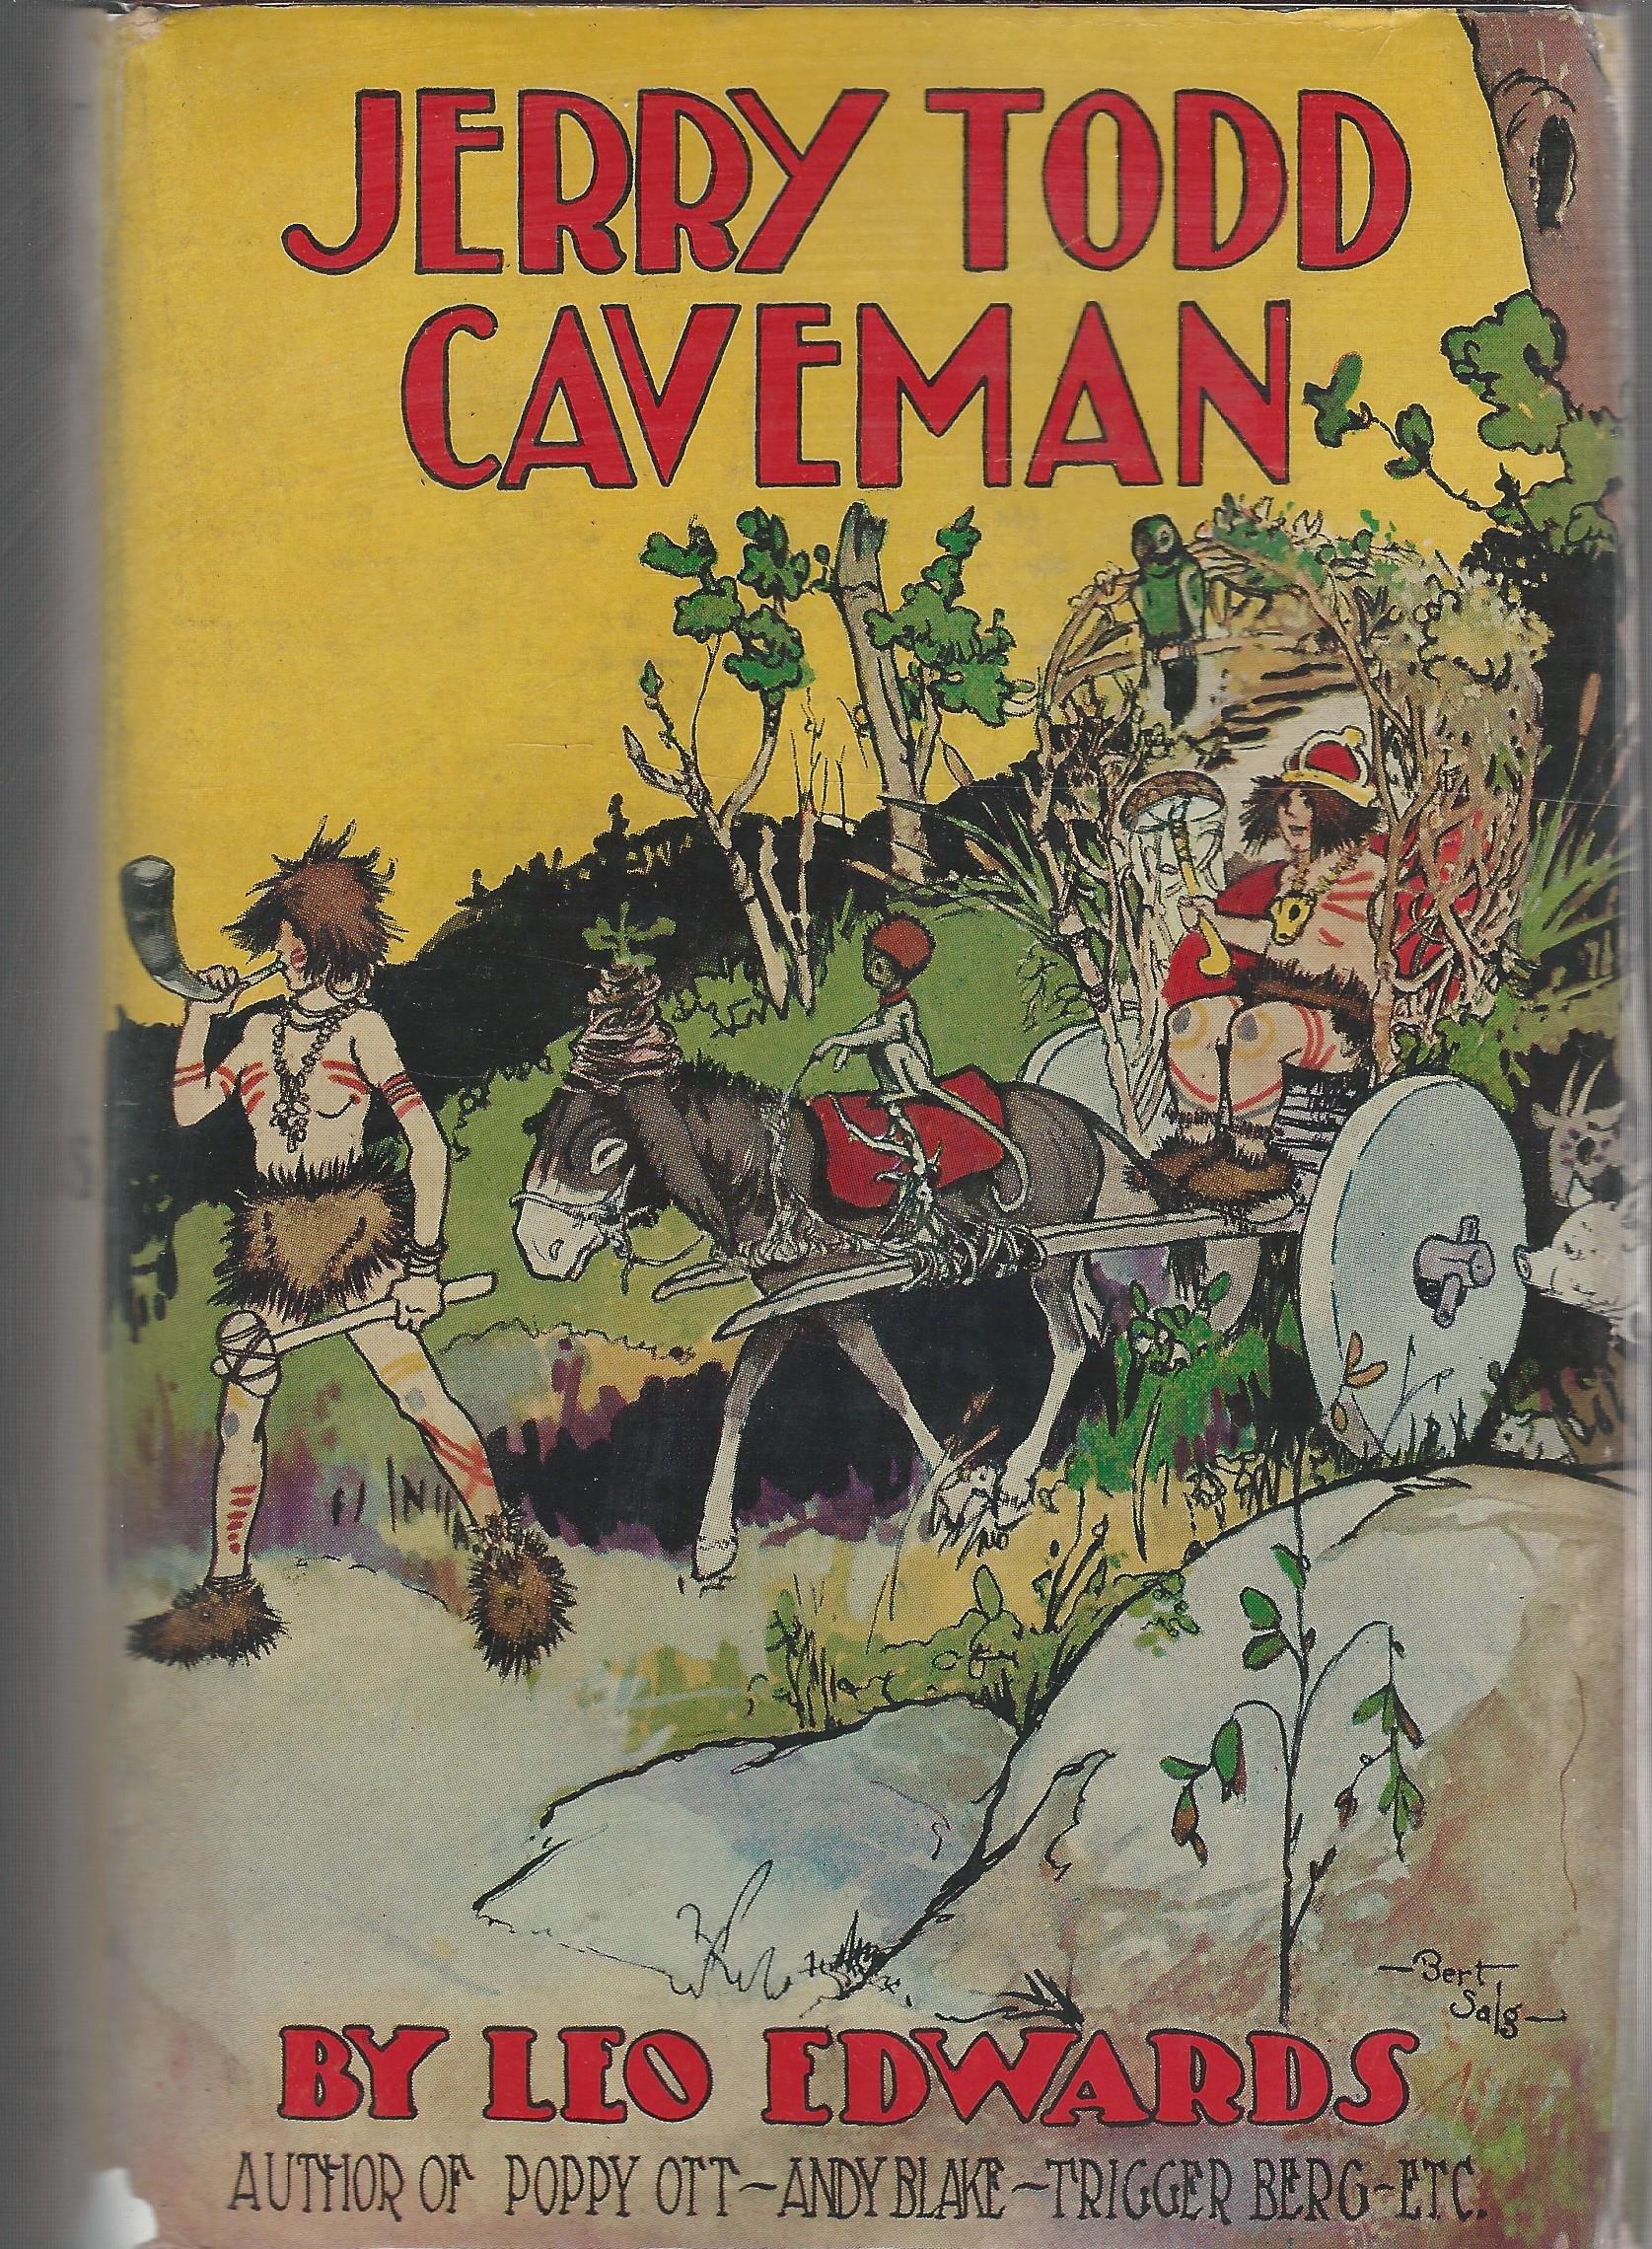 Jerry Todd Caveman (#11 in series): Leo Edwards, Bert Slag ...